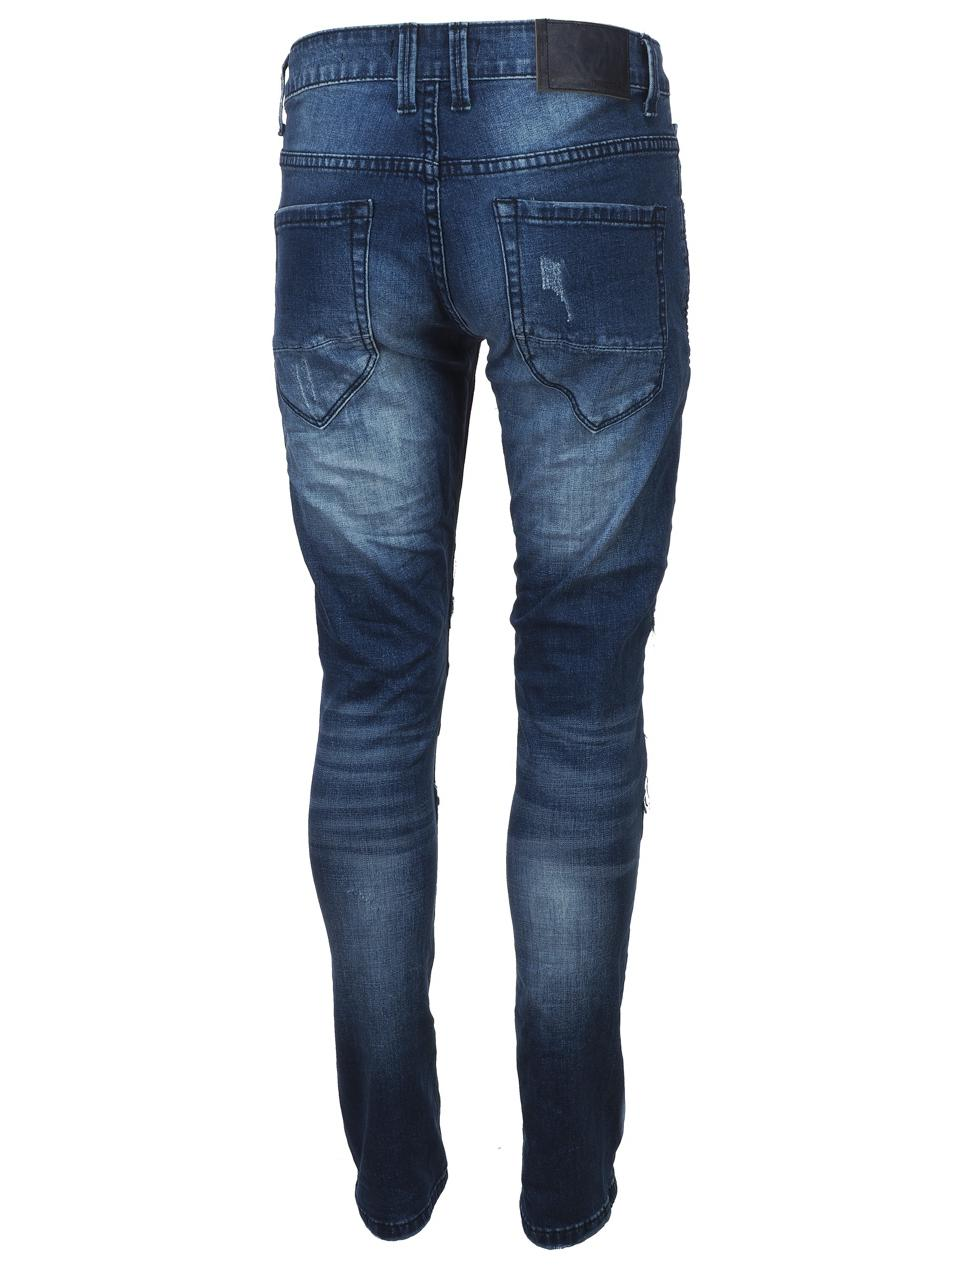 Jeans-Pants-Senders-Angeles-Used-Blue-H-Blue-39982-New thumbnail 5